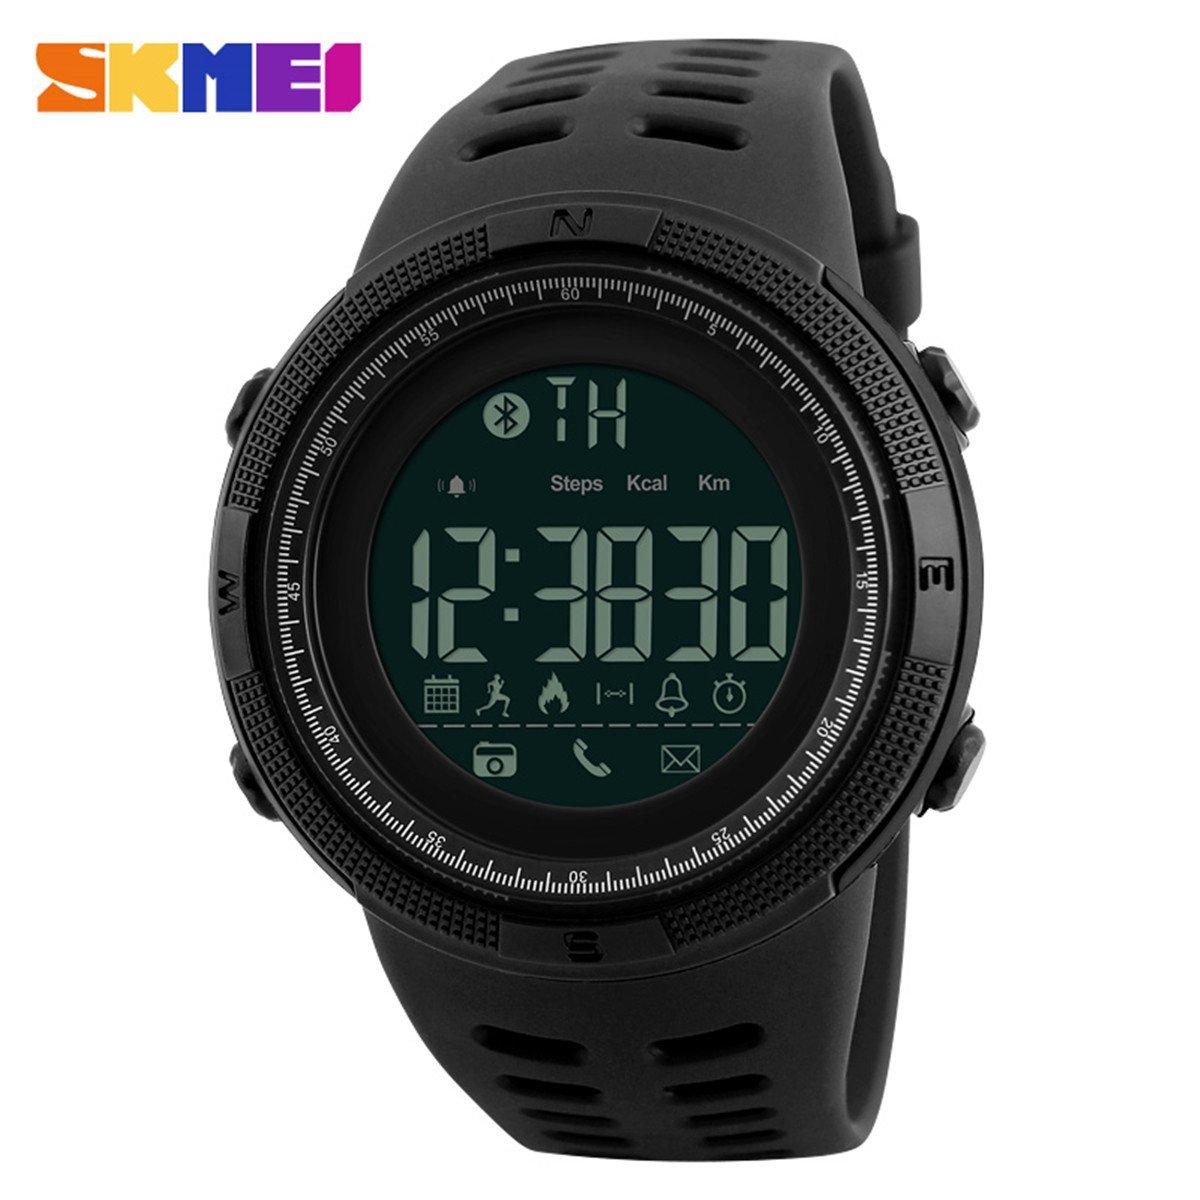 Amazon.com: SKMEI Brand Mens Smart Sport Watch New Bluetooth Calorie Pedometer Fashion Watches Men 50M Waterproof Digital Clock Wristwatch: Cell Phones & ...